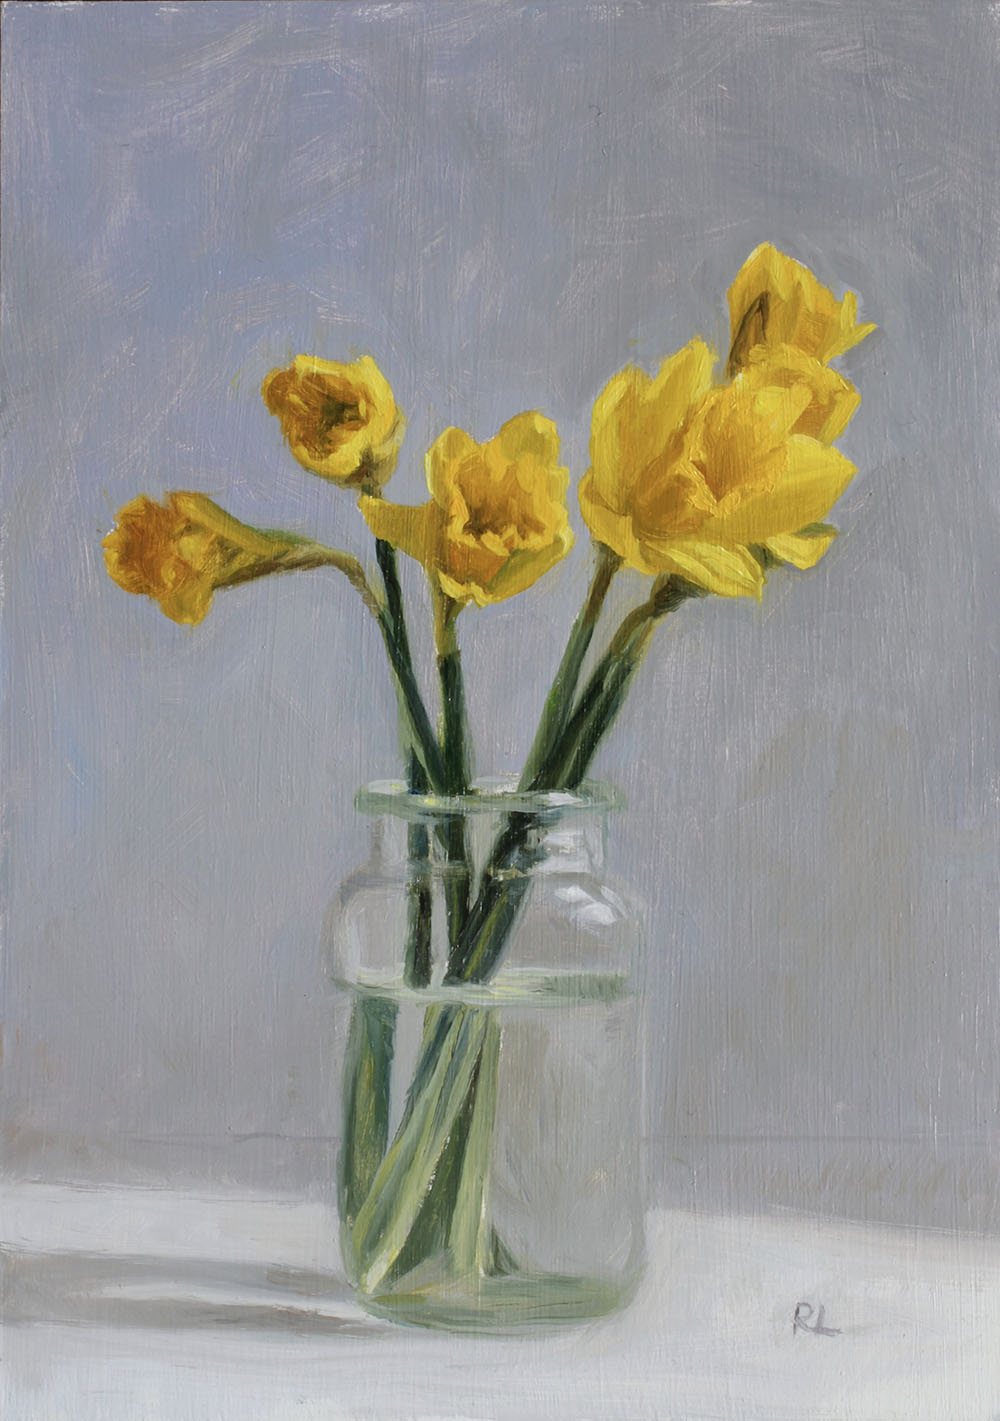 Daffodils Opening